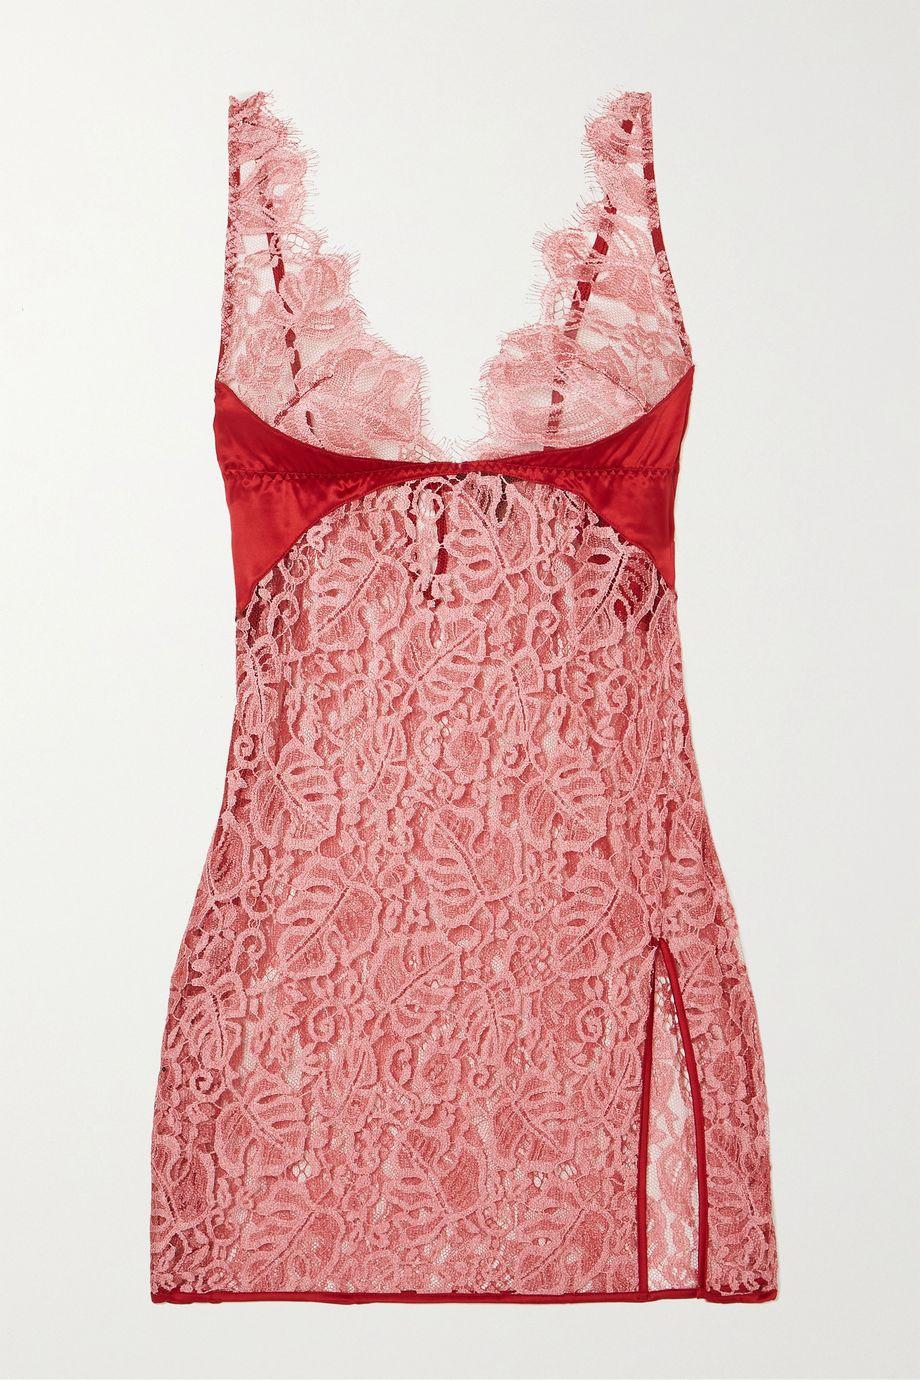 Coco de Mer Anthurium lace and satin camisole